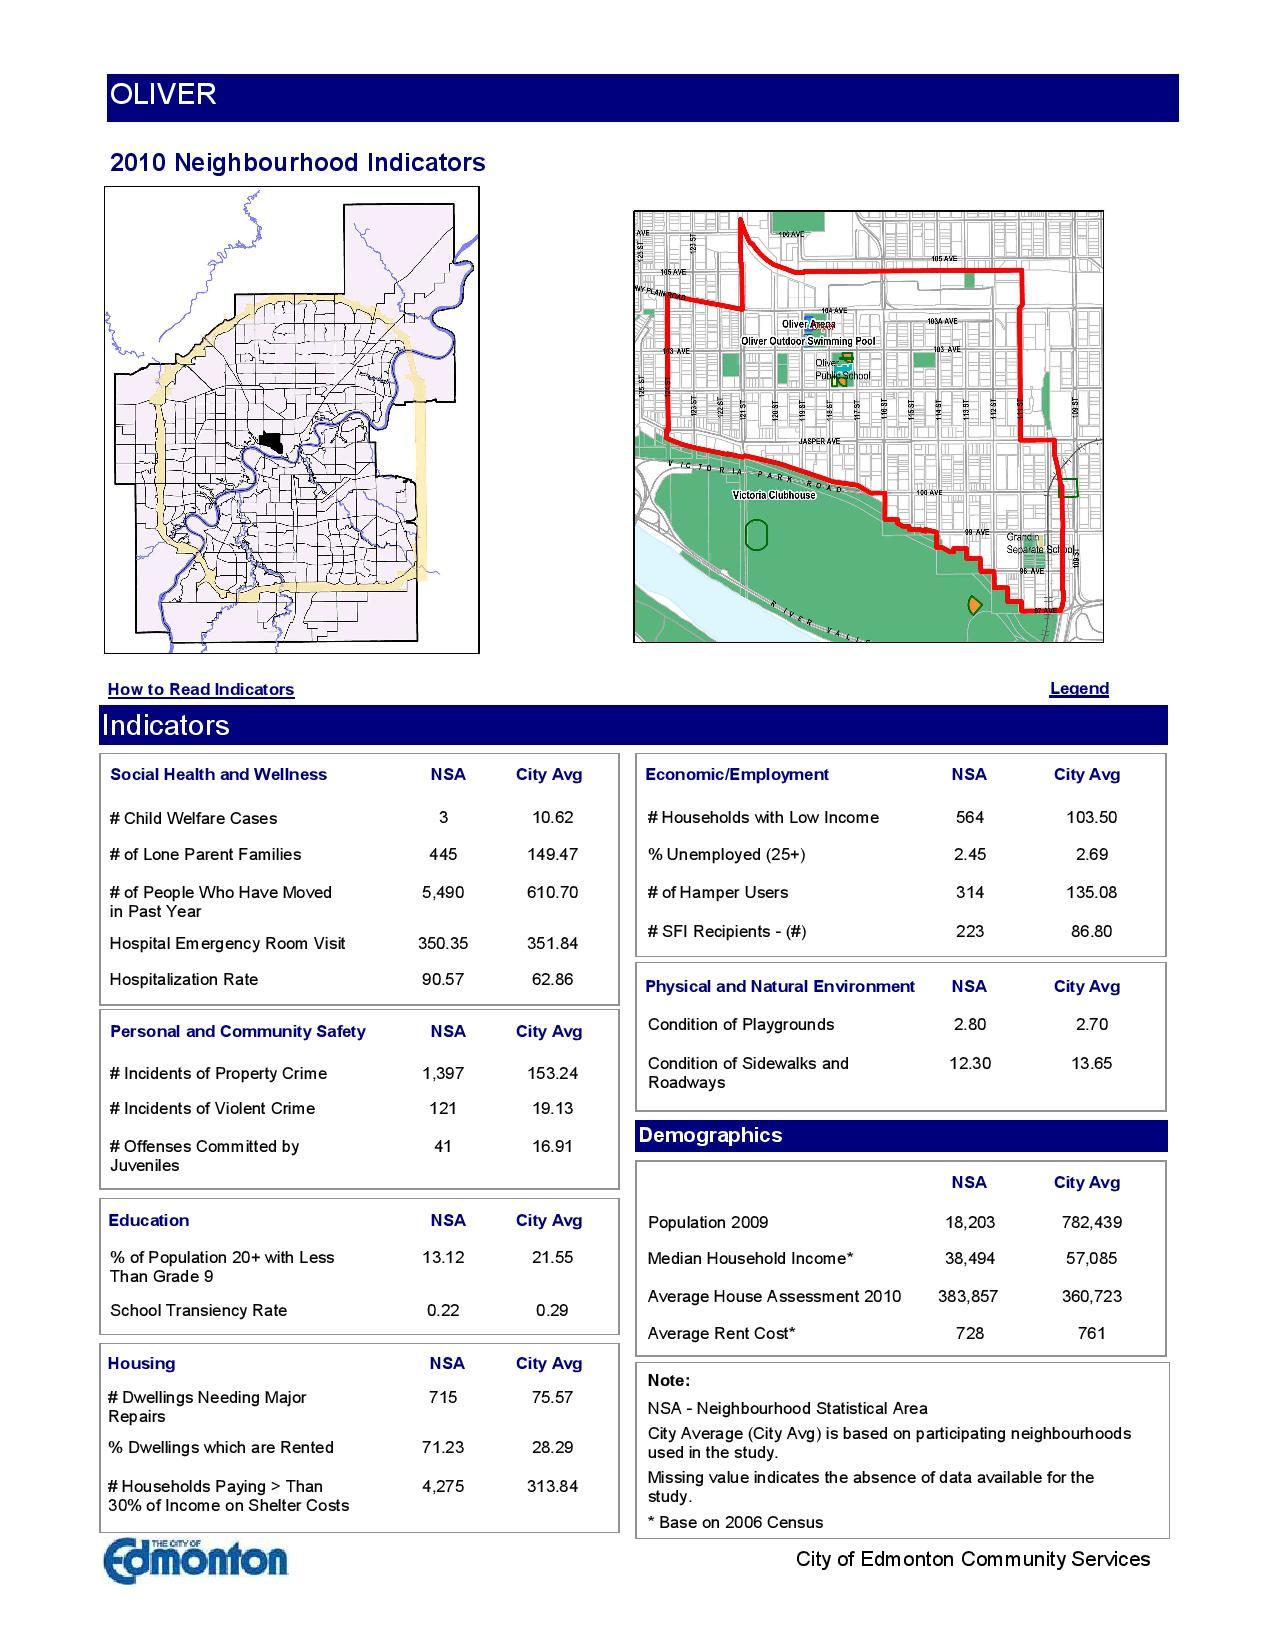 Oliver Edmonton condo prices and incomes